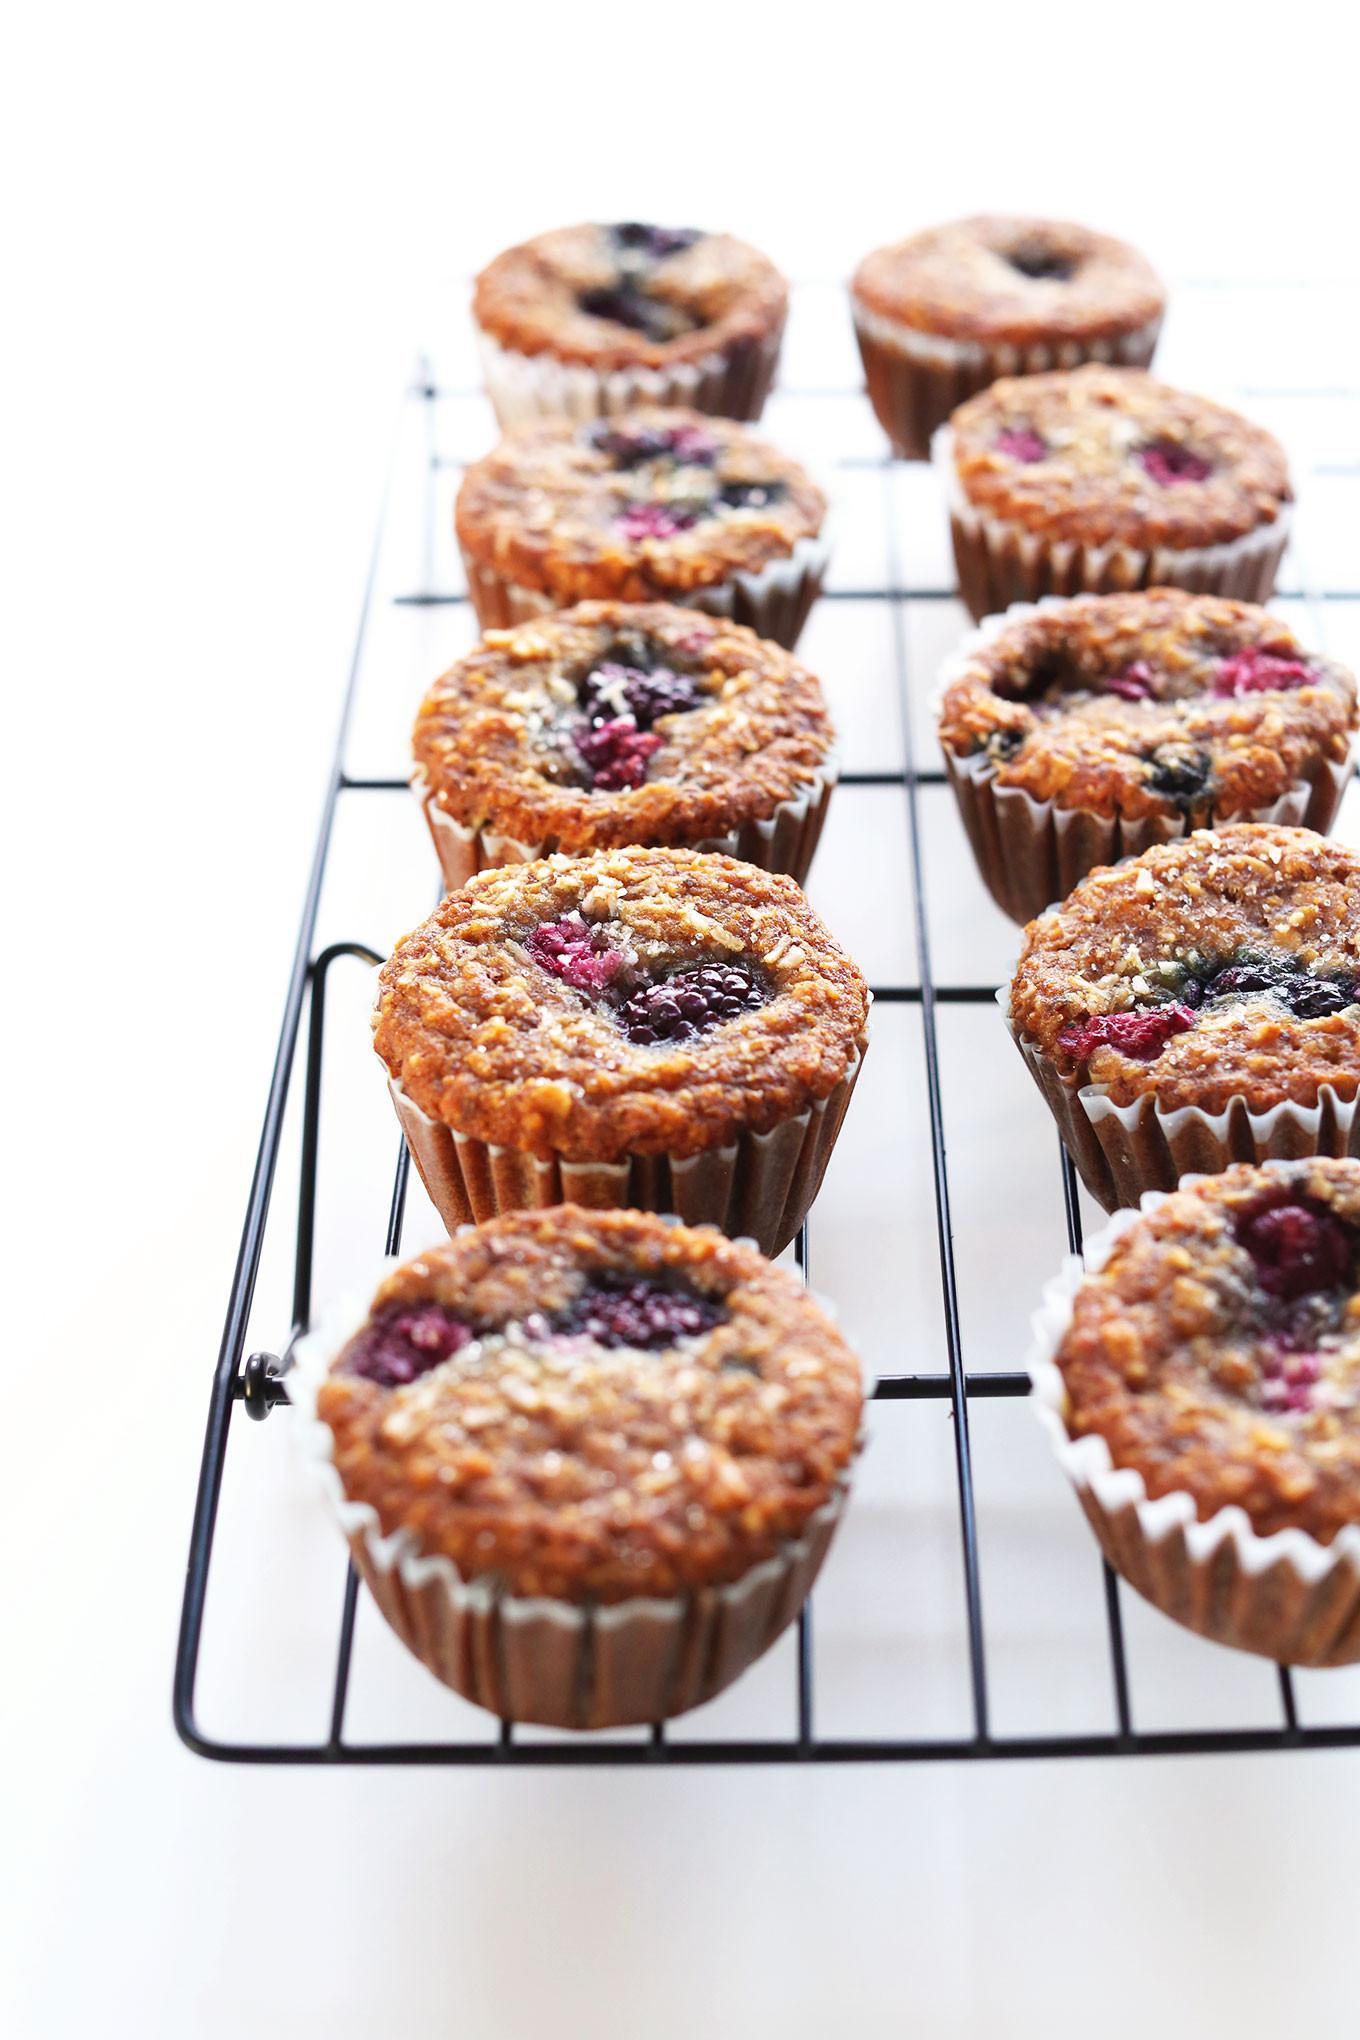 Healthy Vegan Breakfast Muffins  Coconut Berry Muffins